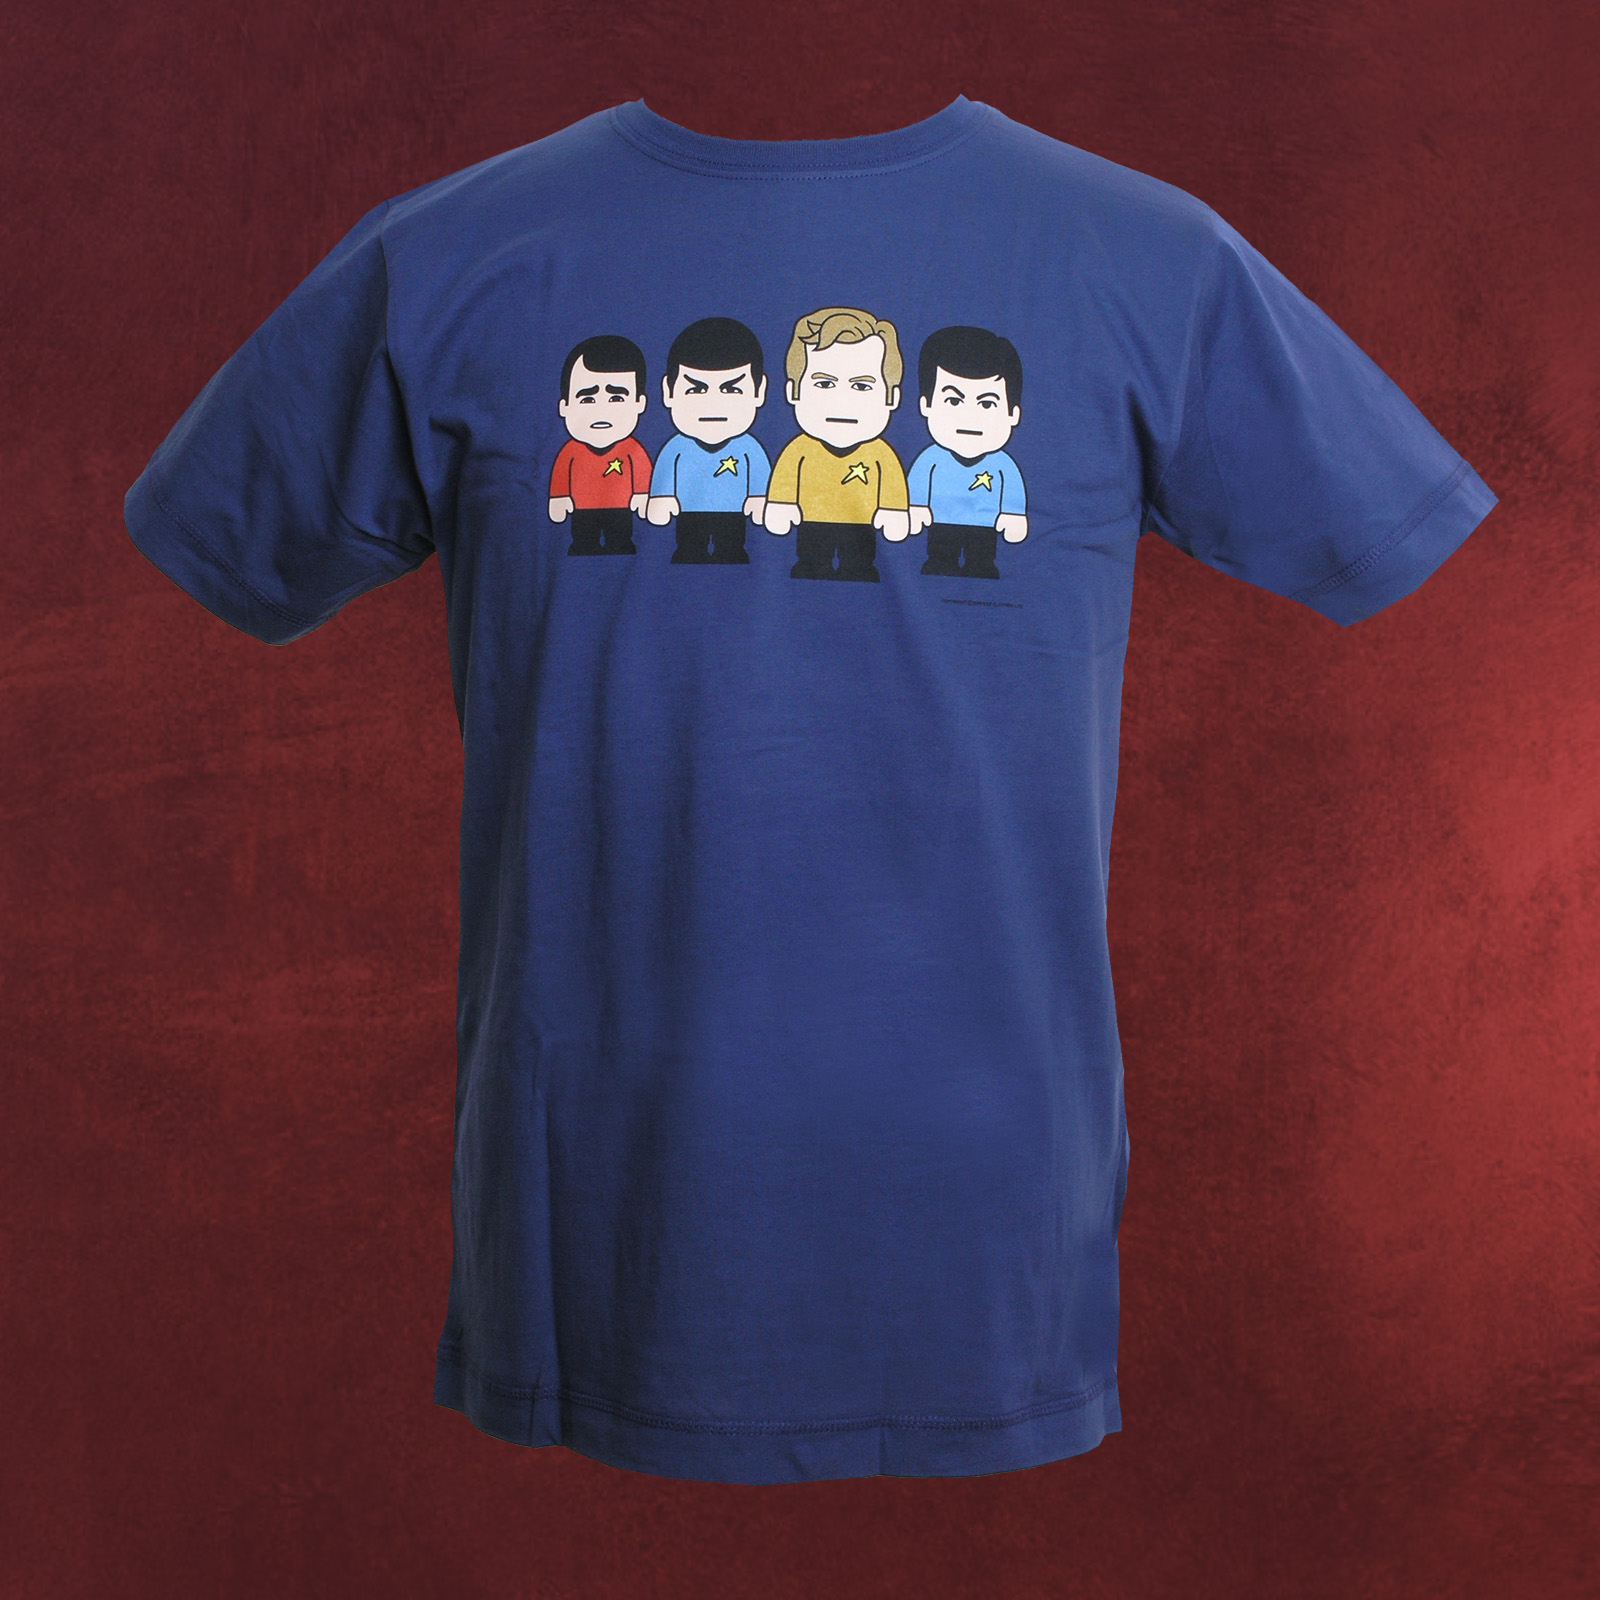 star trek toonstar marken t shirt f r scifi fans mit kirk spock scotty mccoy ebay. Black Bedroom Furniture Sets. Home Design Ideas